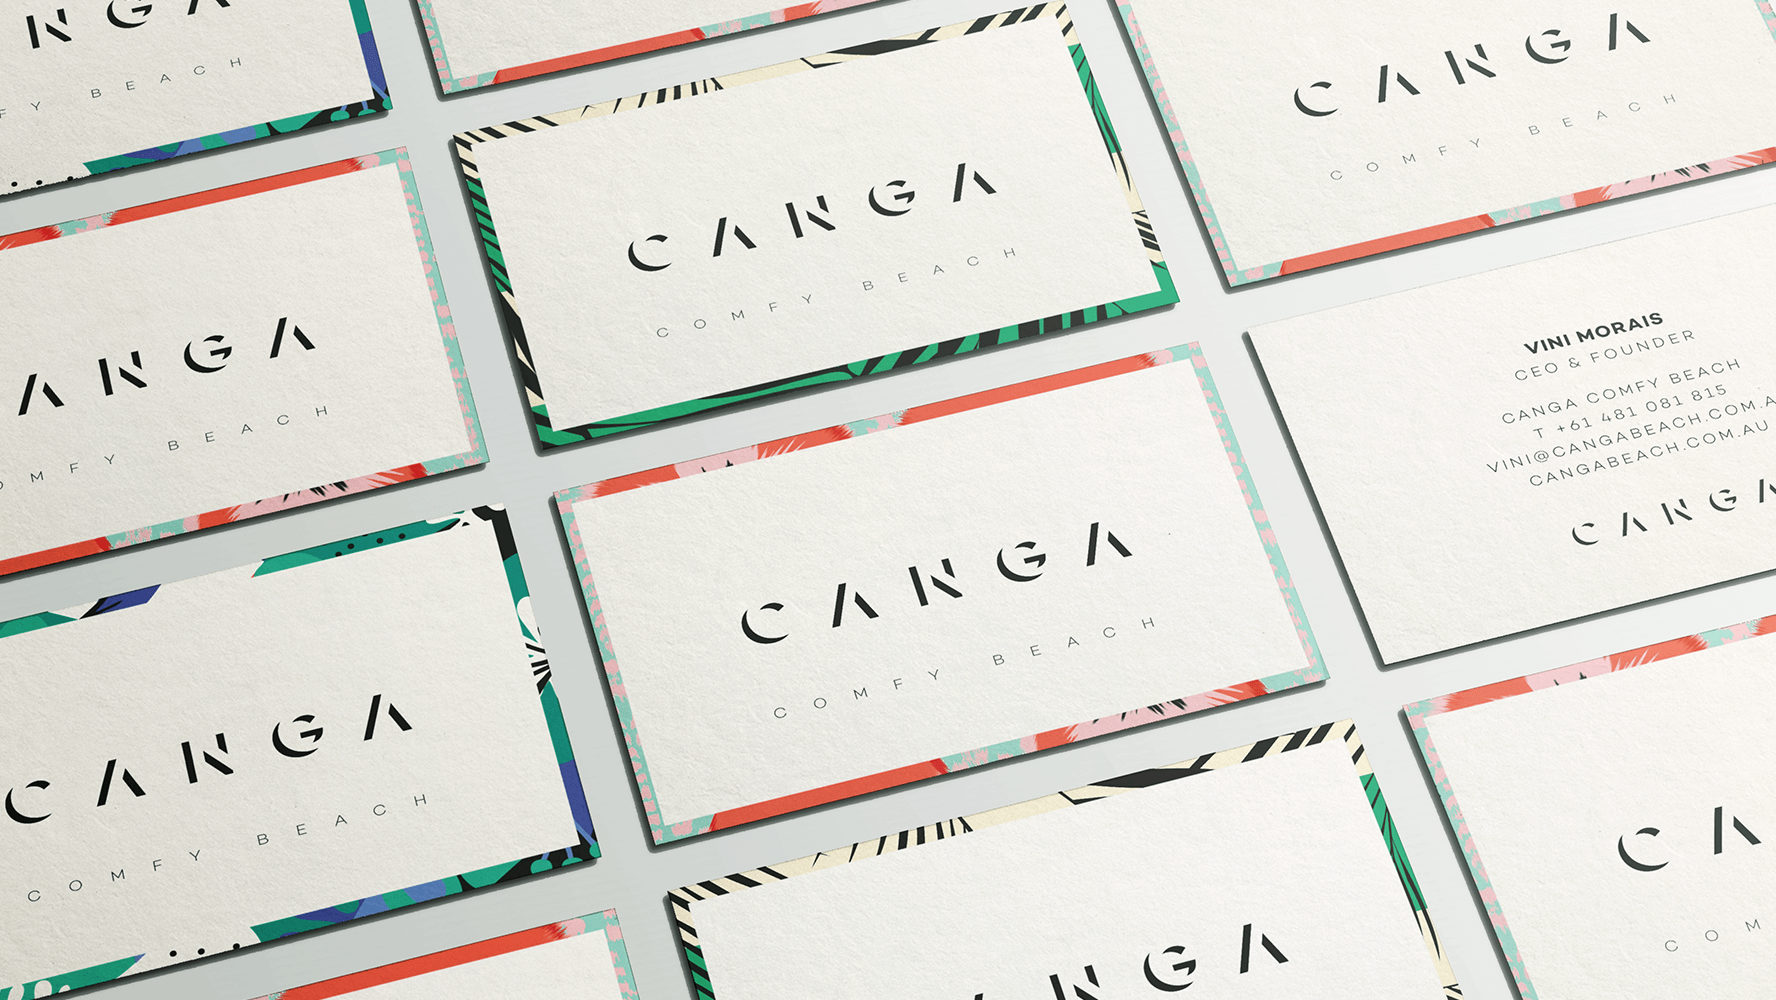 CANGA Branding and Pattern